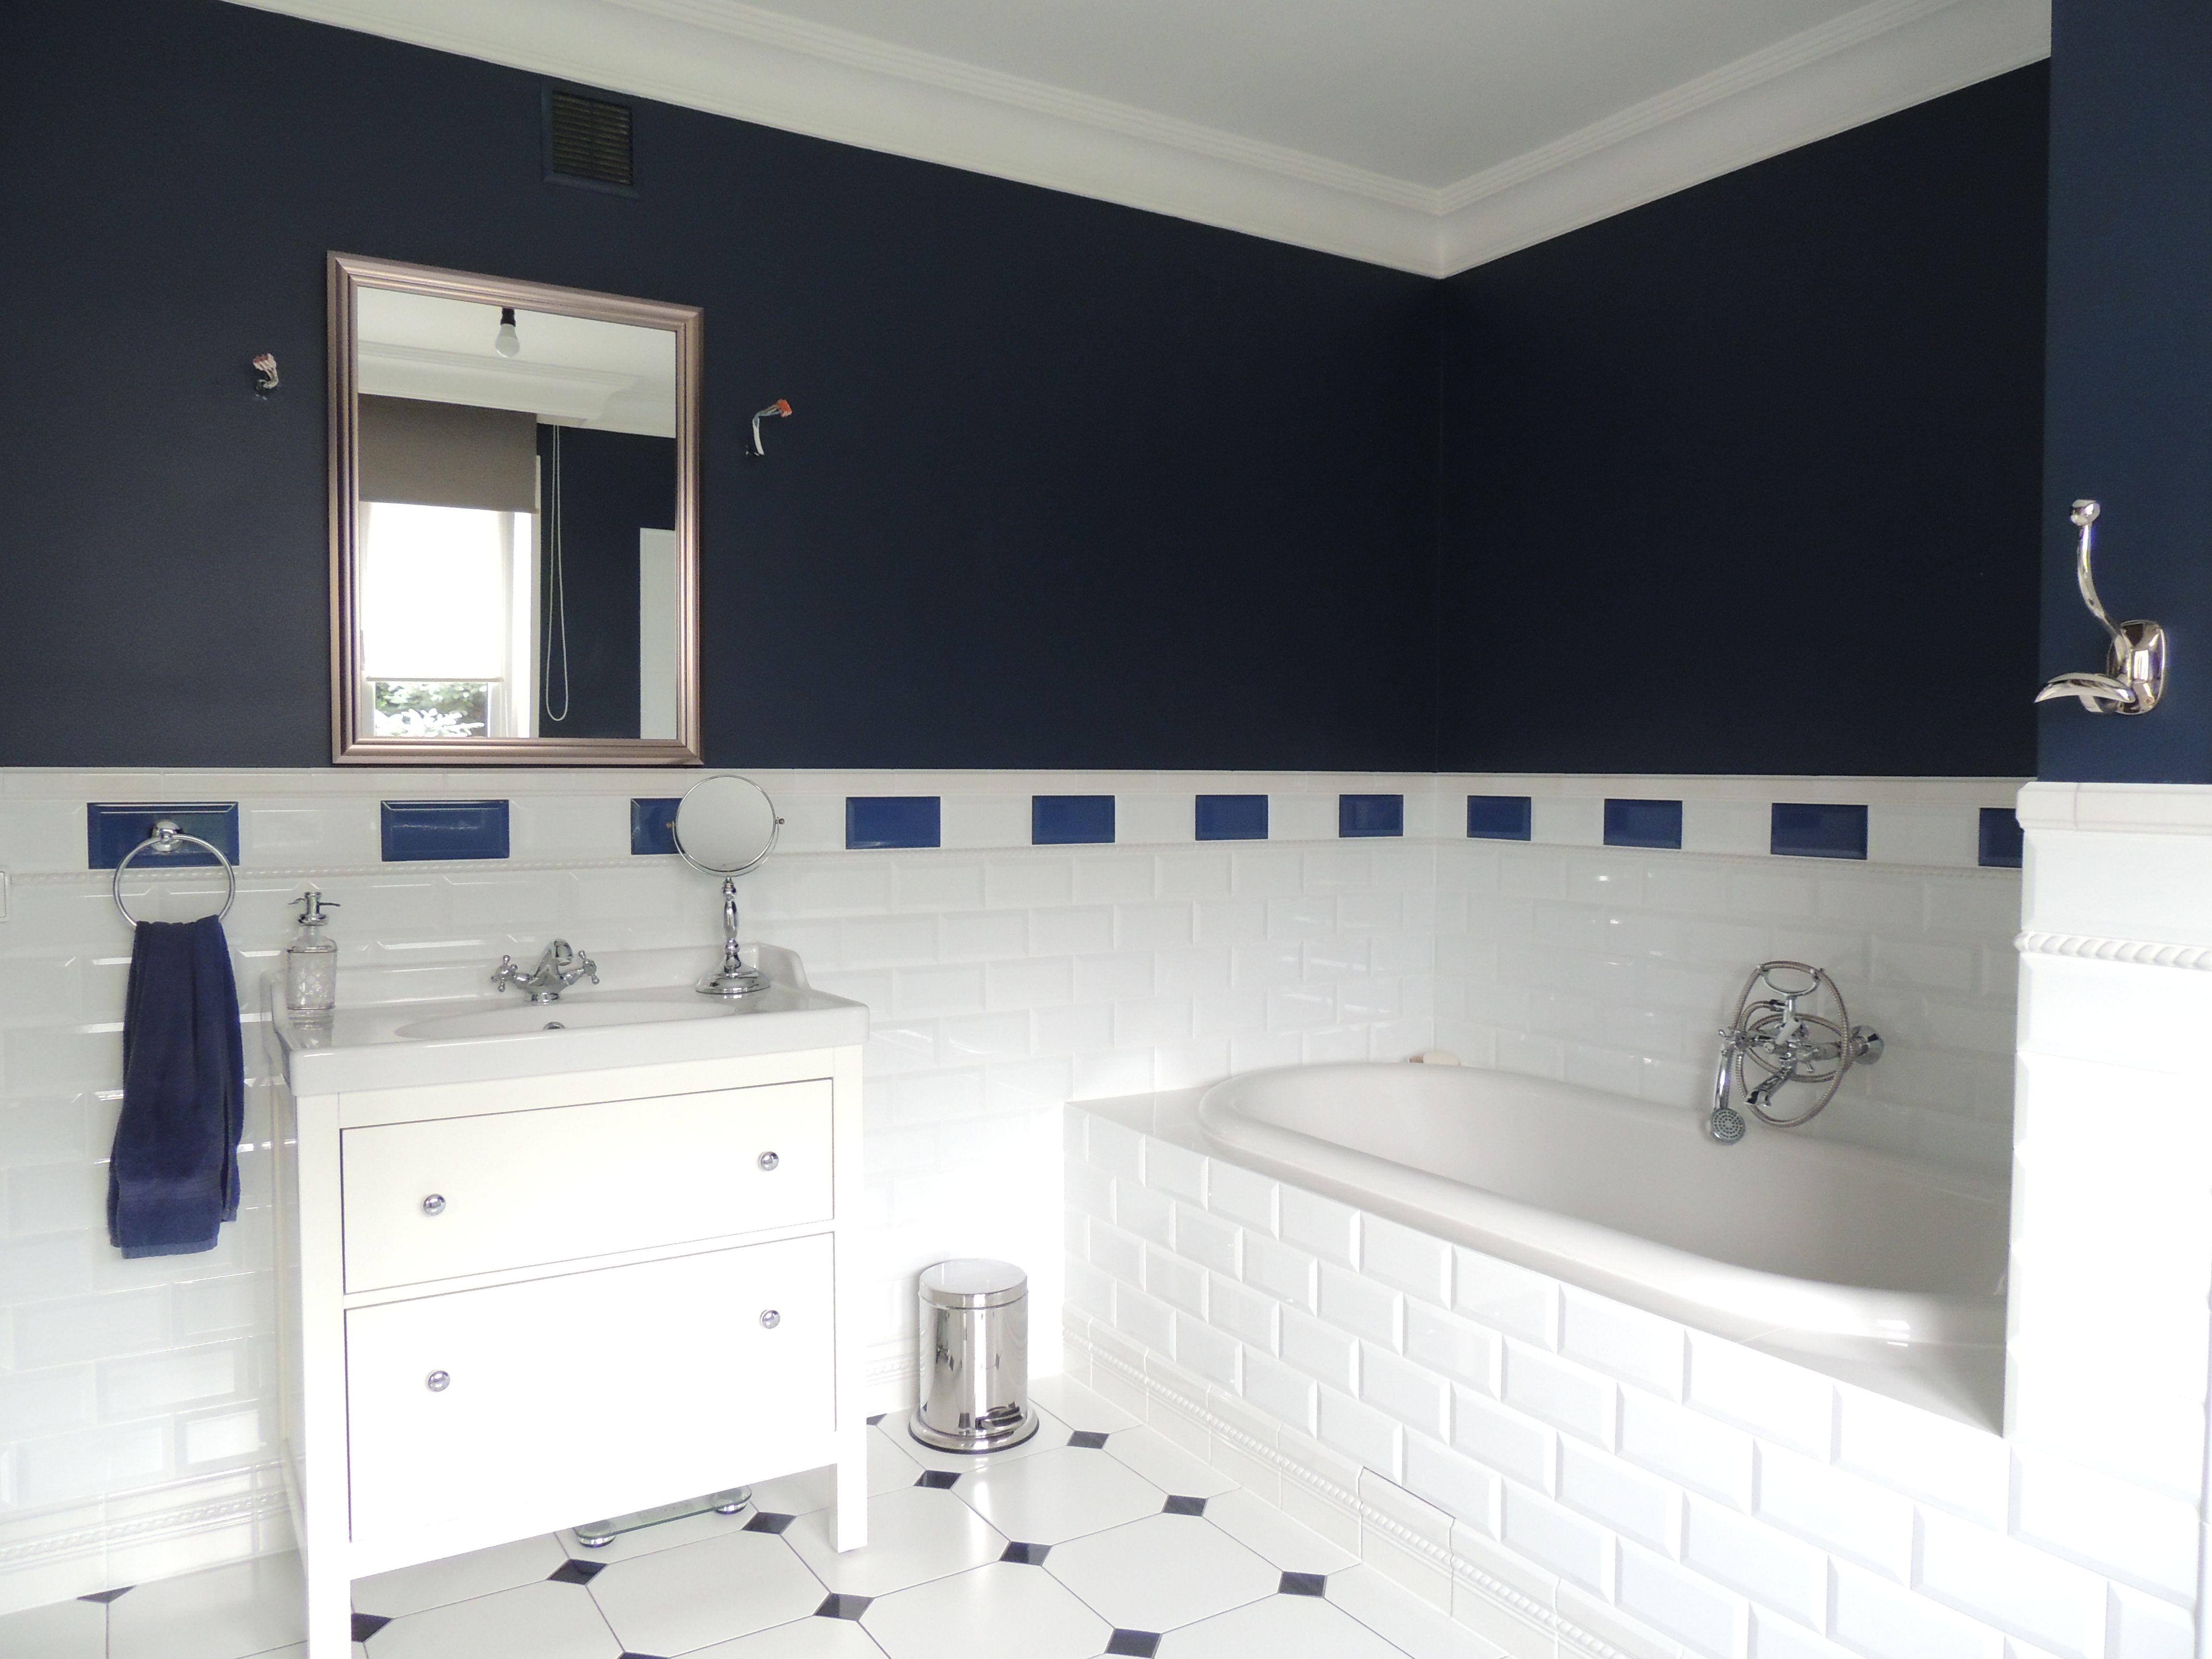 Bathroom Navy Blue White łazienka Granat Biały My Home